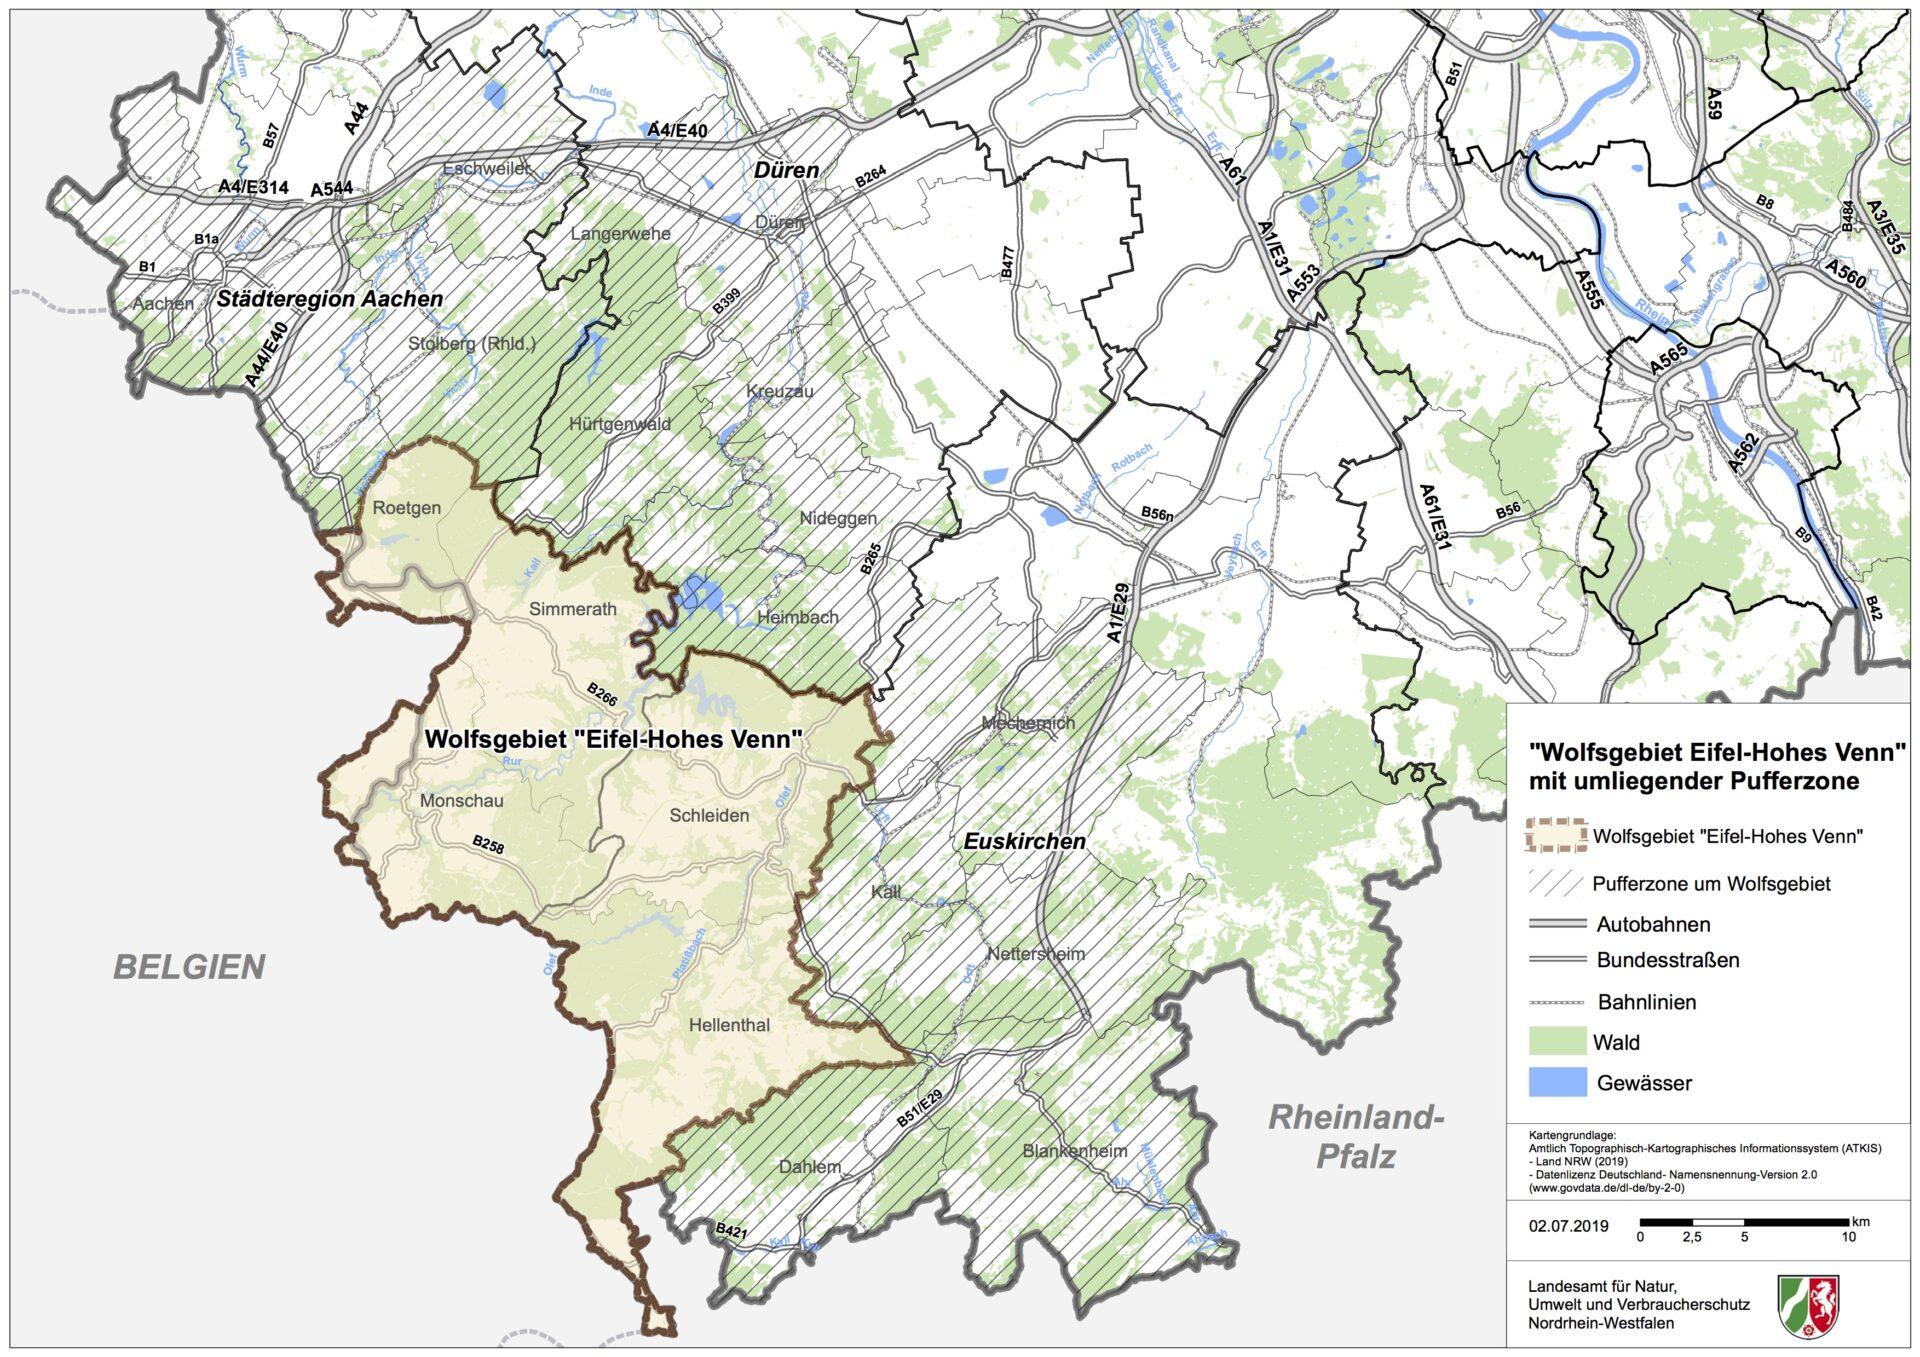 Karte Eifel.Nordrhein Westfalen Eifel Hohes Venn Ist Drittes Wolfsgebiet